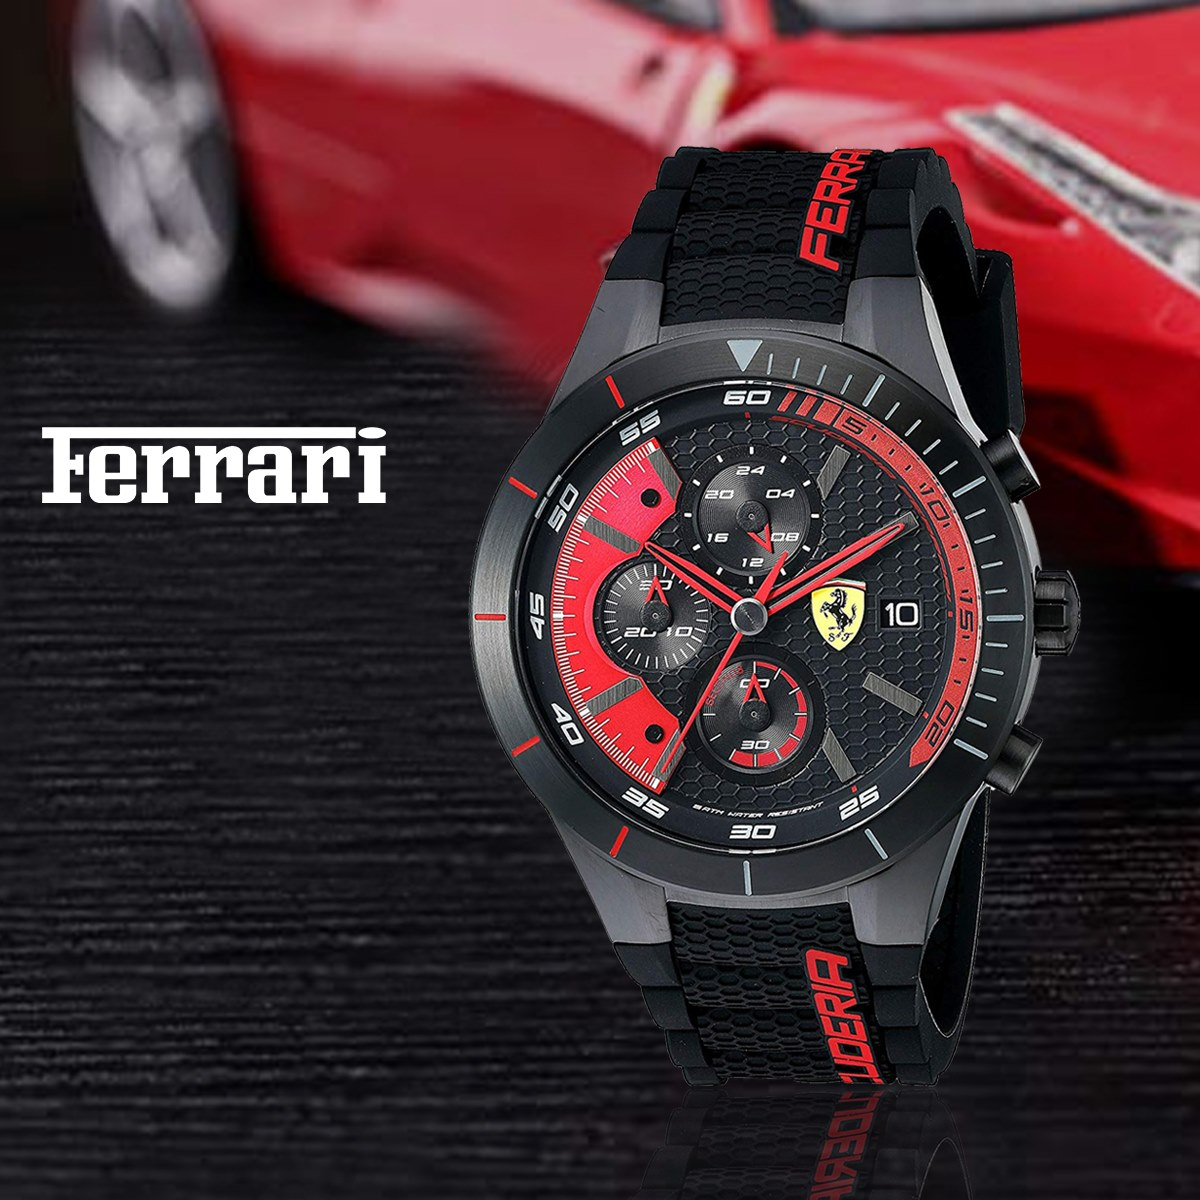 Ferrari Scuderia Ferrari Analog Black Dial Men's Watch.  Model 830260 Price Rs.54,300